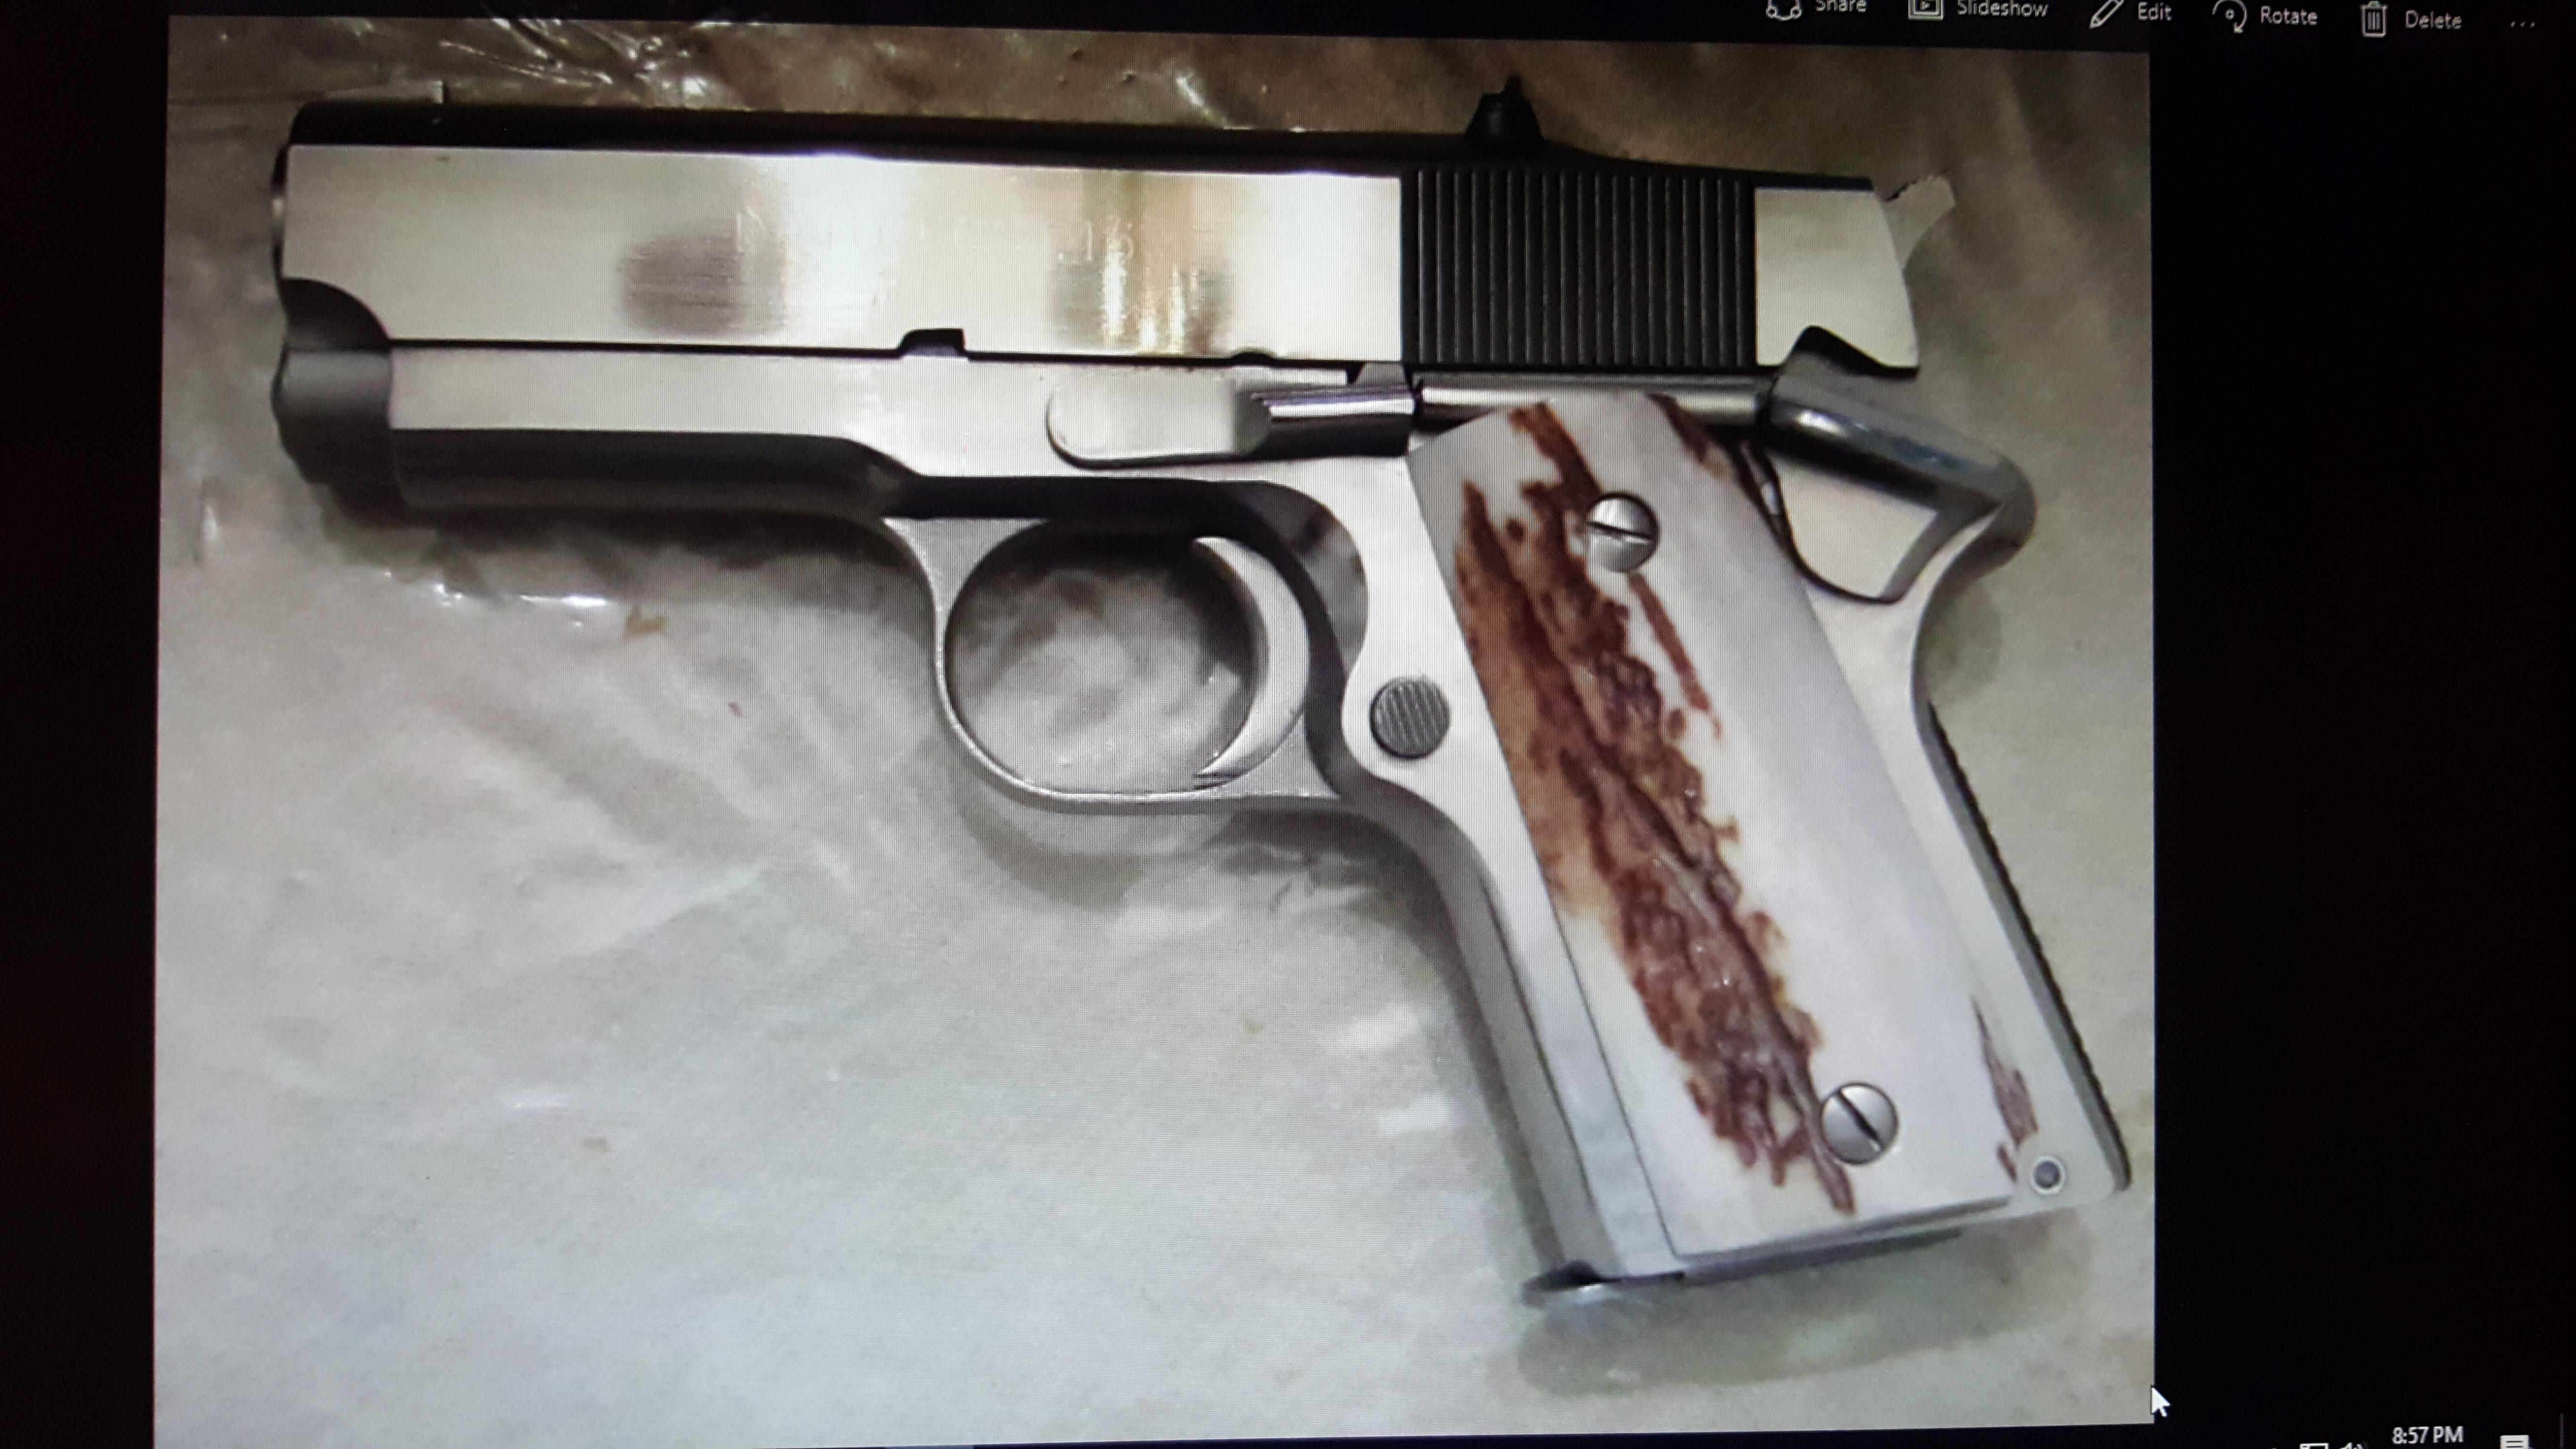 The BBQ gun.-20161206_205710-1-.jpg